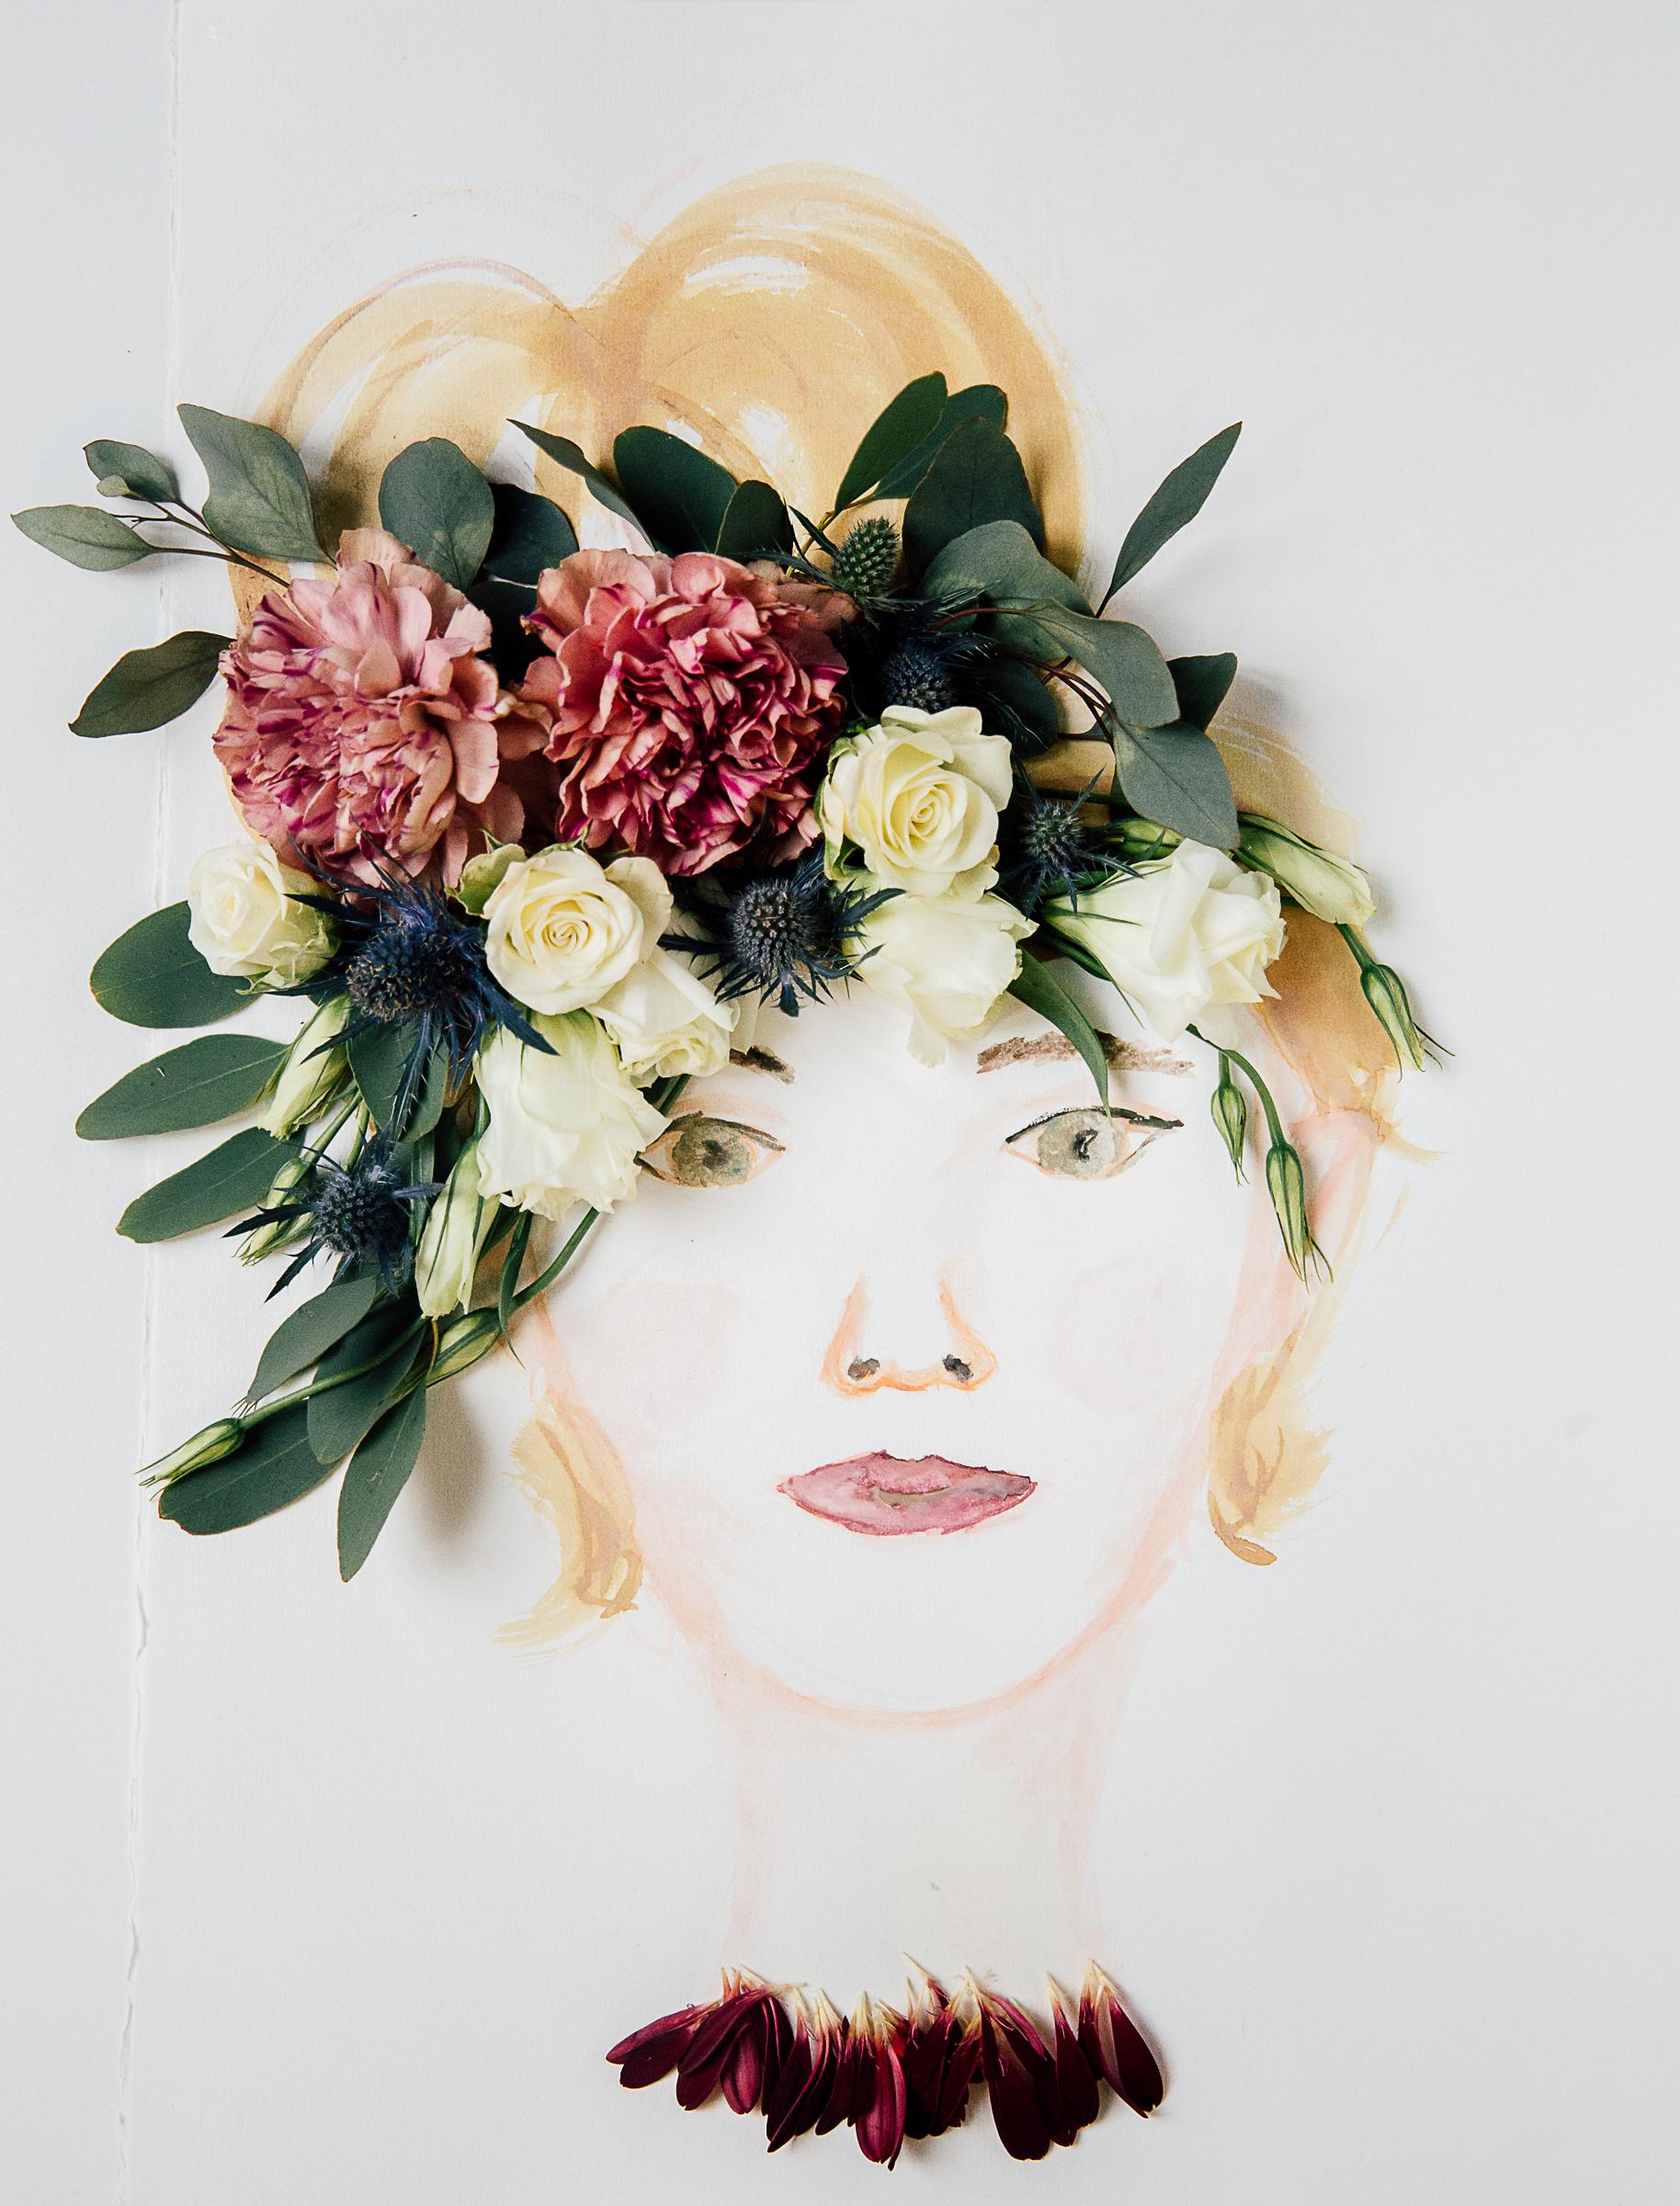 petal-portraits-make-flower-furbish-1027.jpg